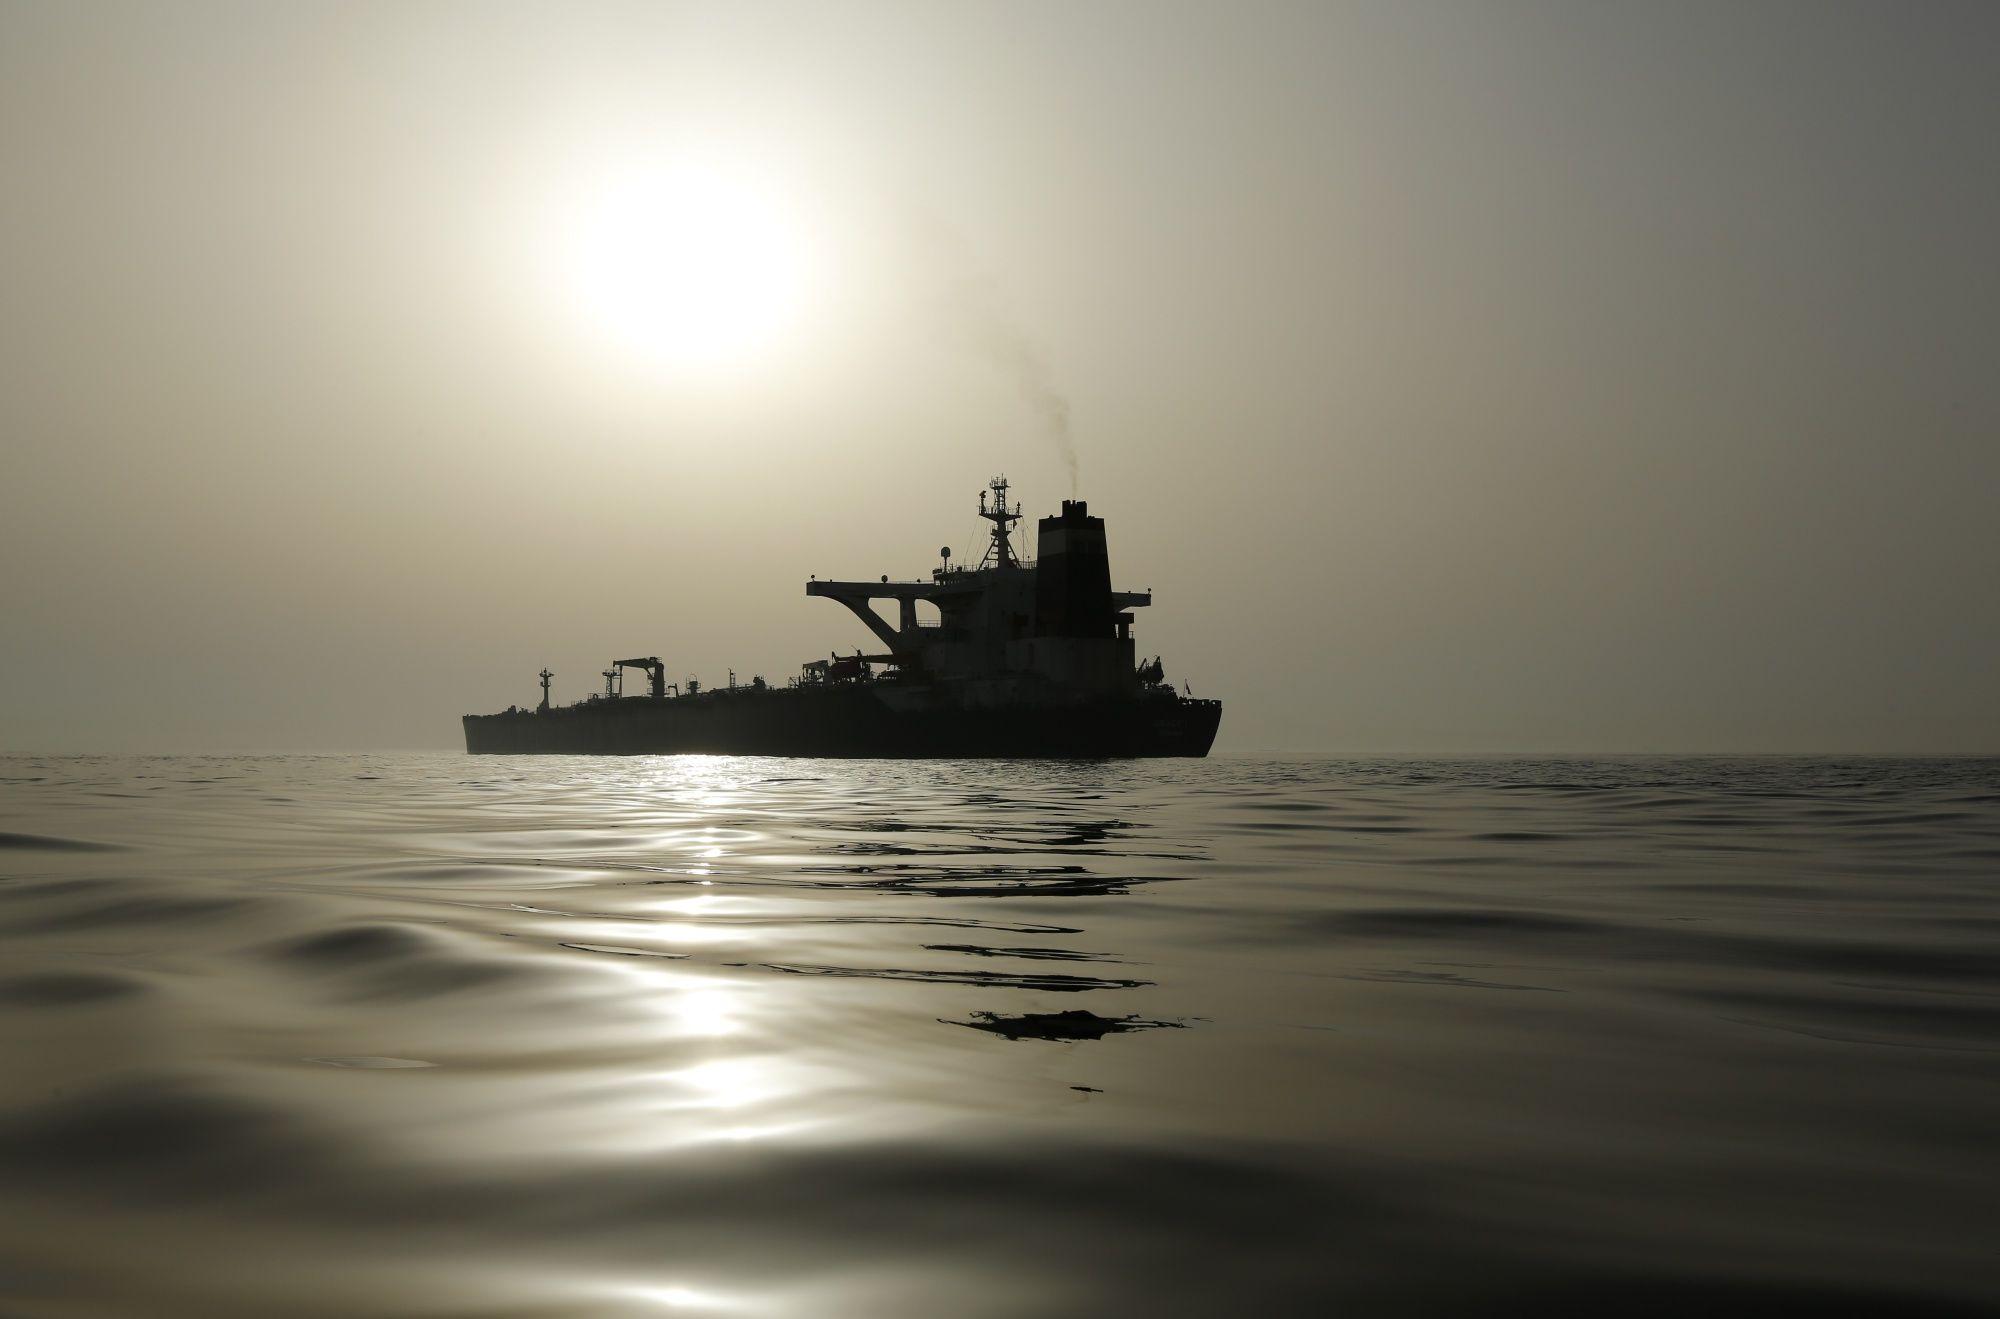 Iran Signals More Escalation With Warning on Gulf Violations